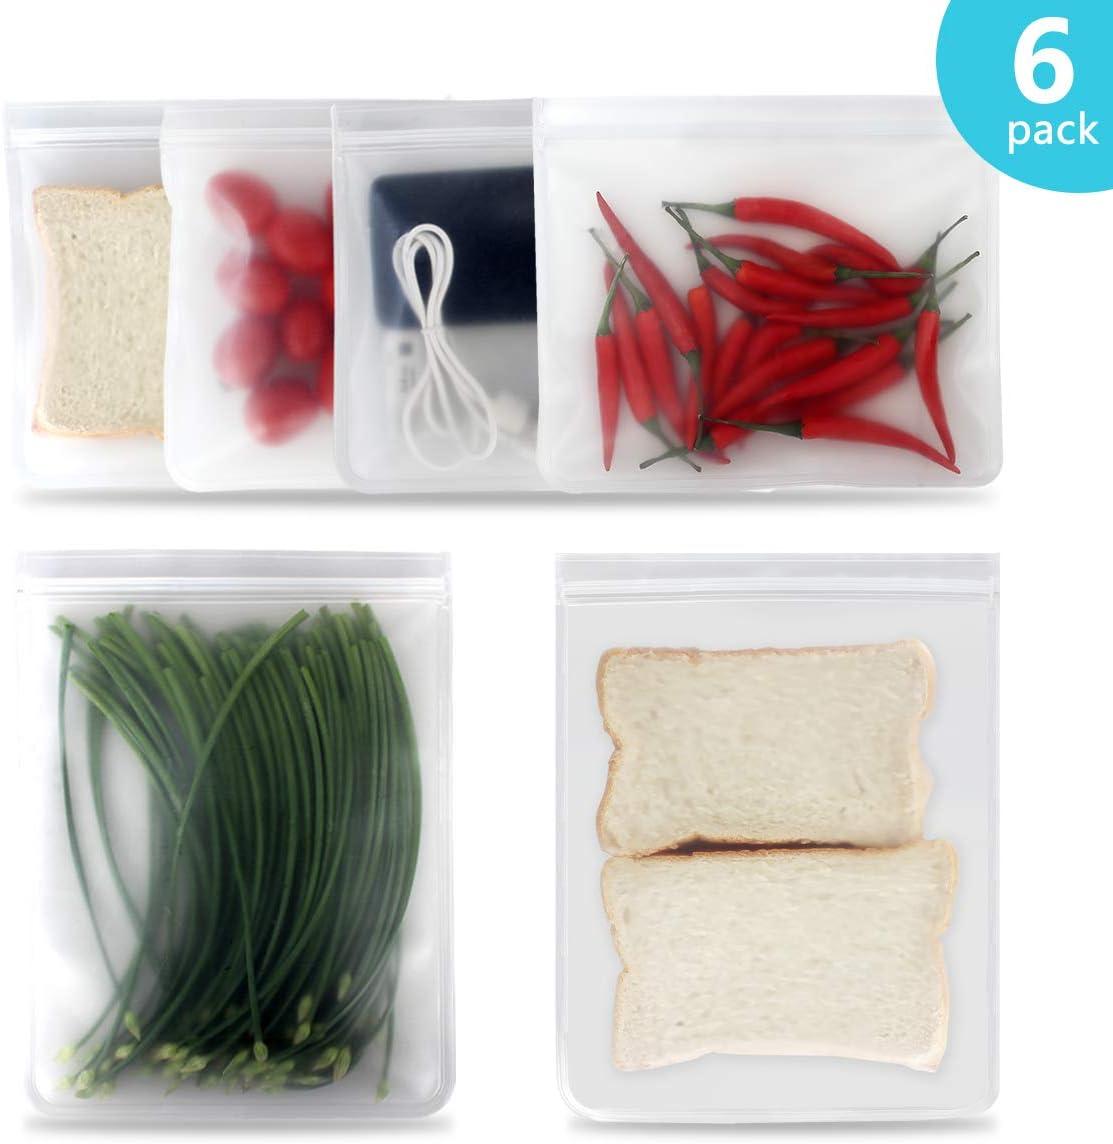 Reusable Sandwich Bags Snack Storage Bags Reusable Food Freezer Plastic Bags 6 Pack